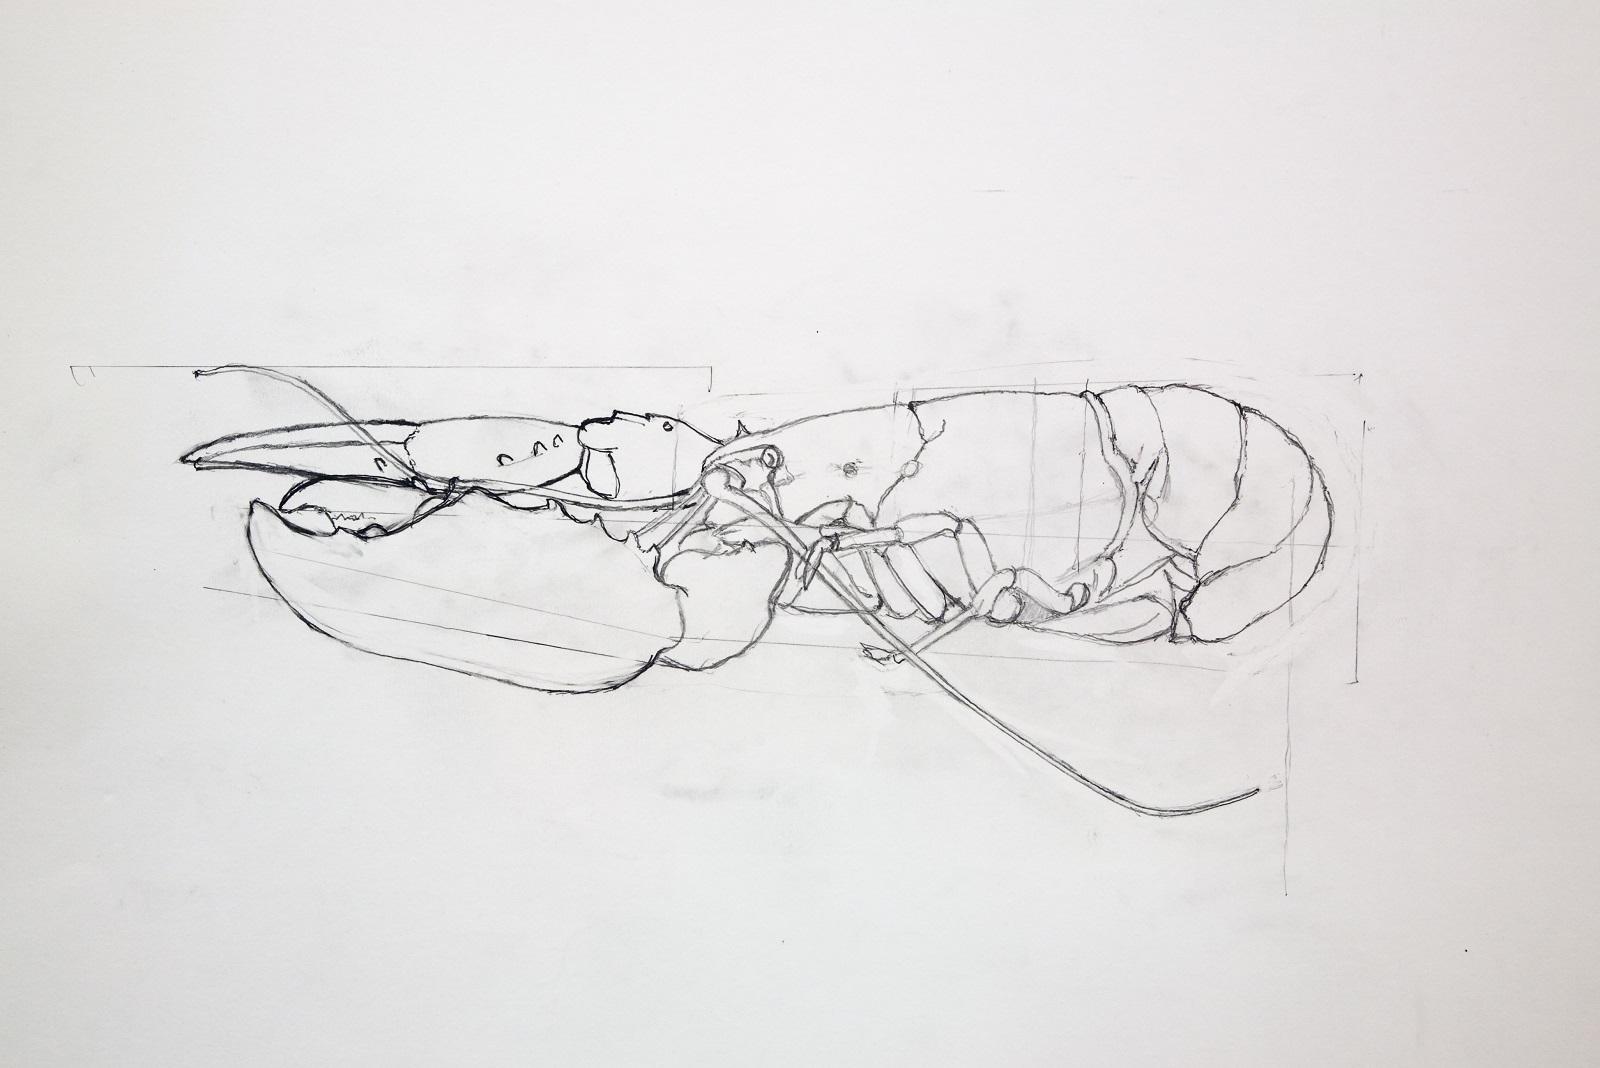 Pencil sketch of a lobster